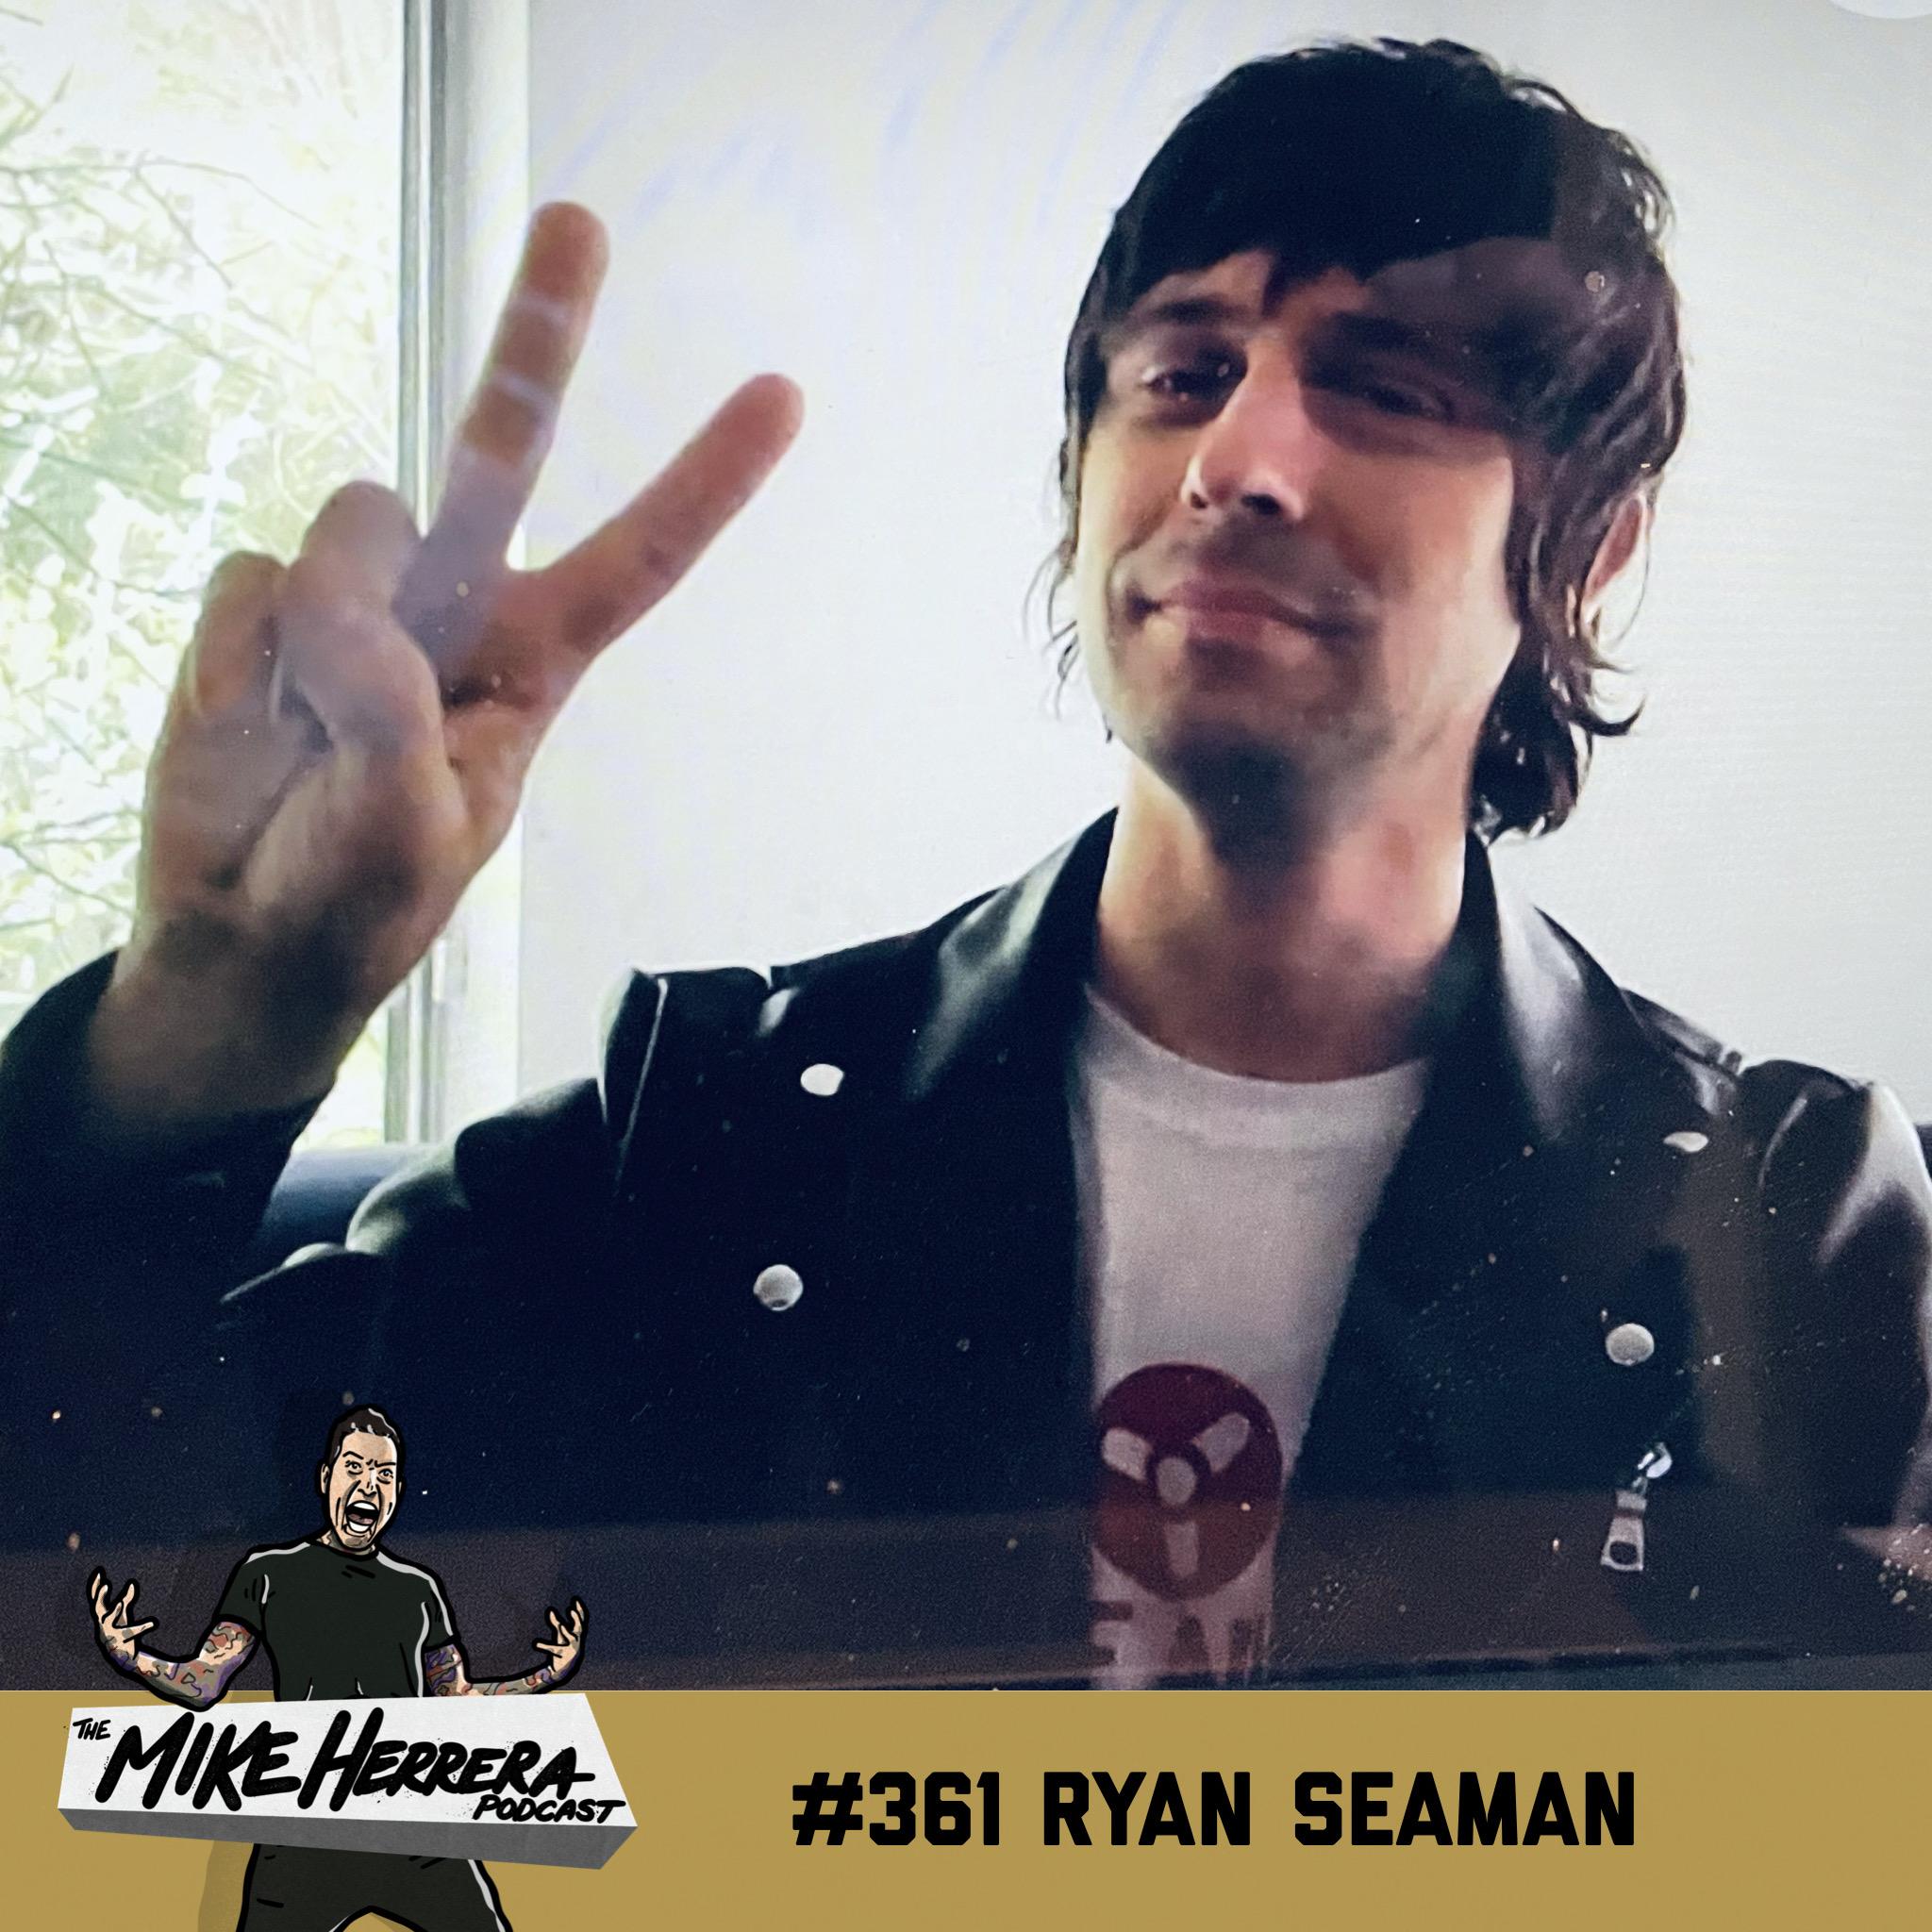 #361 Ryan Seaman